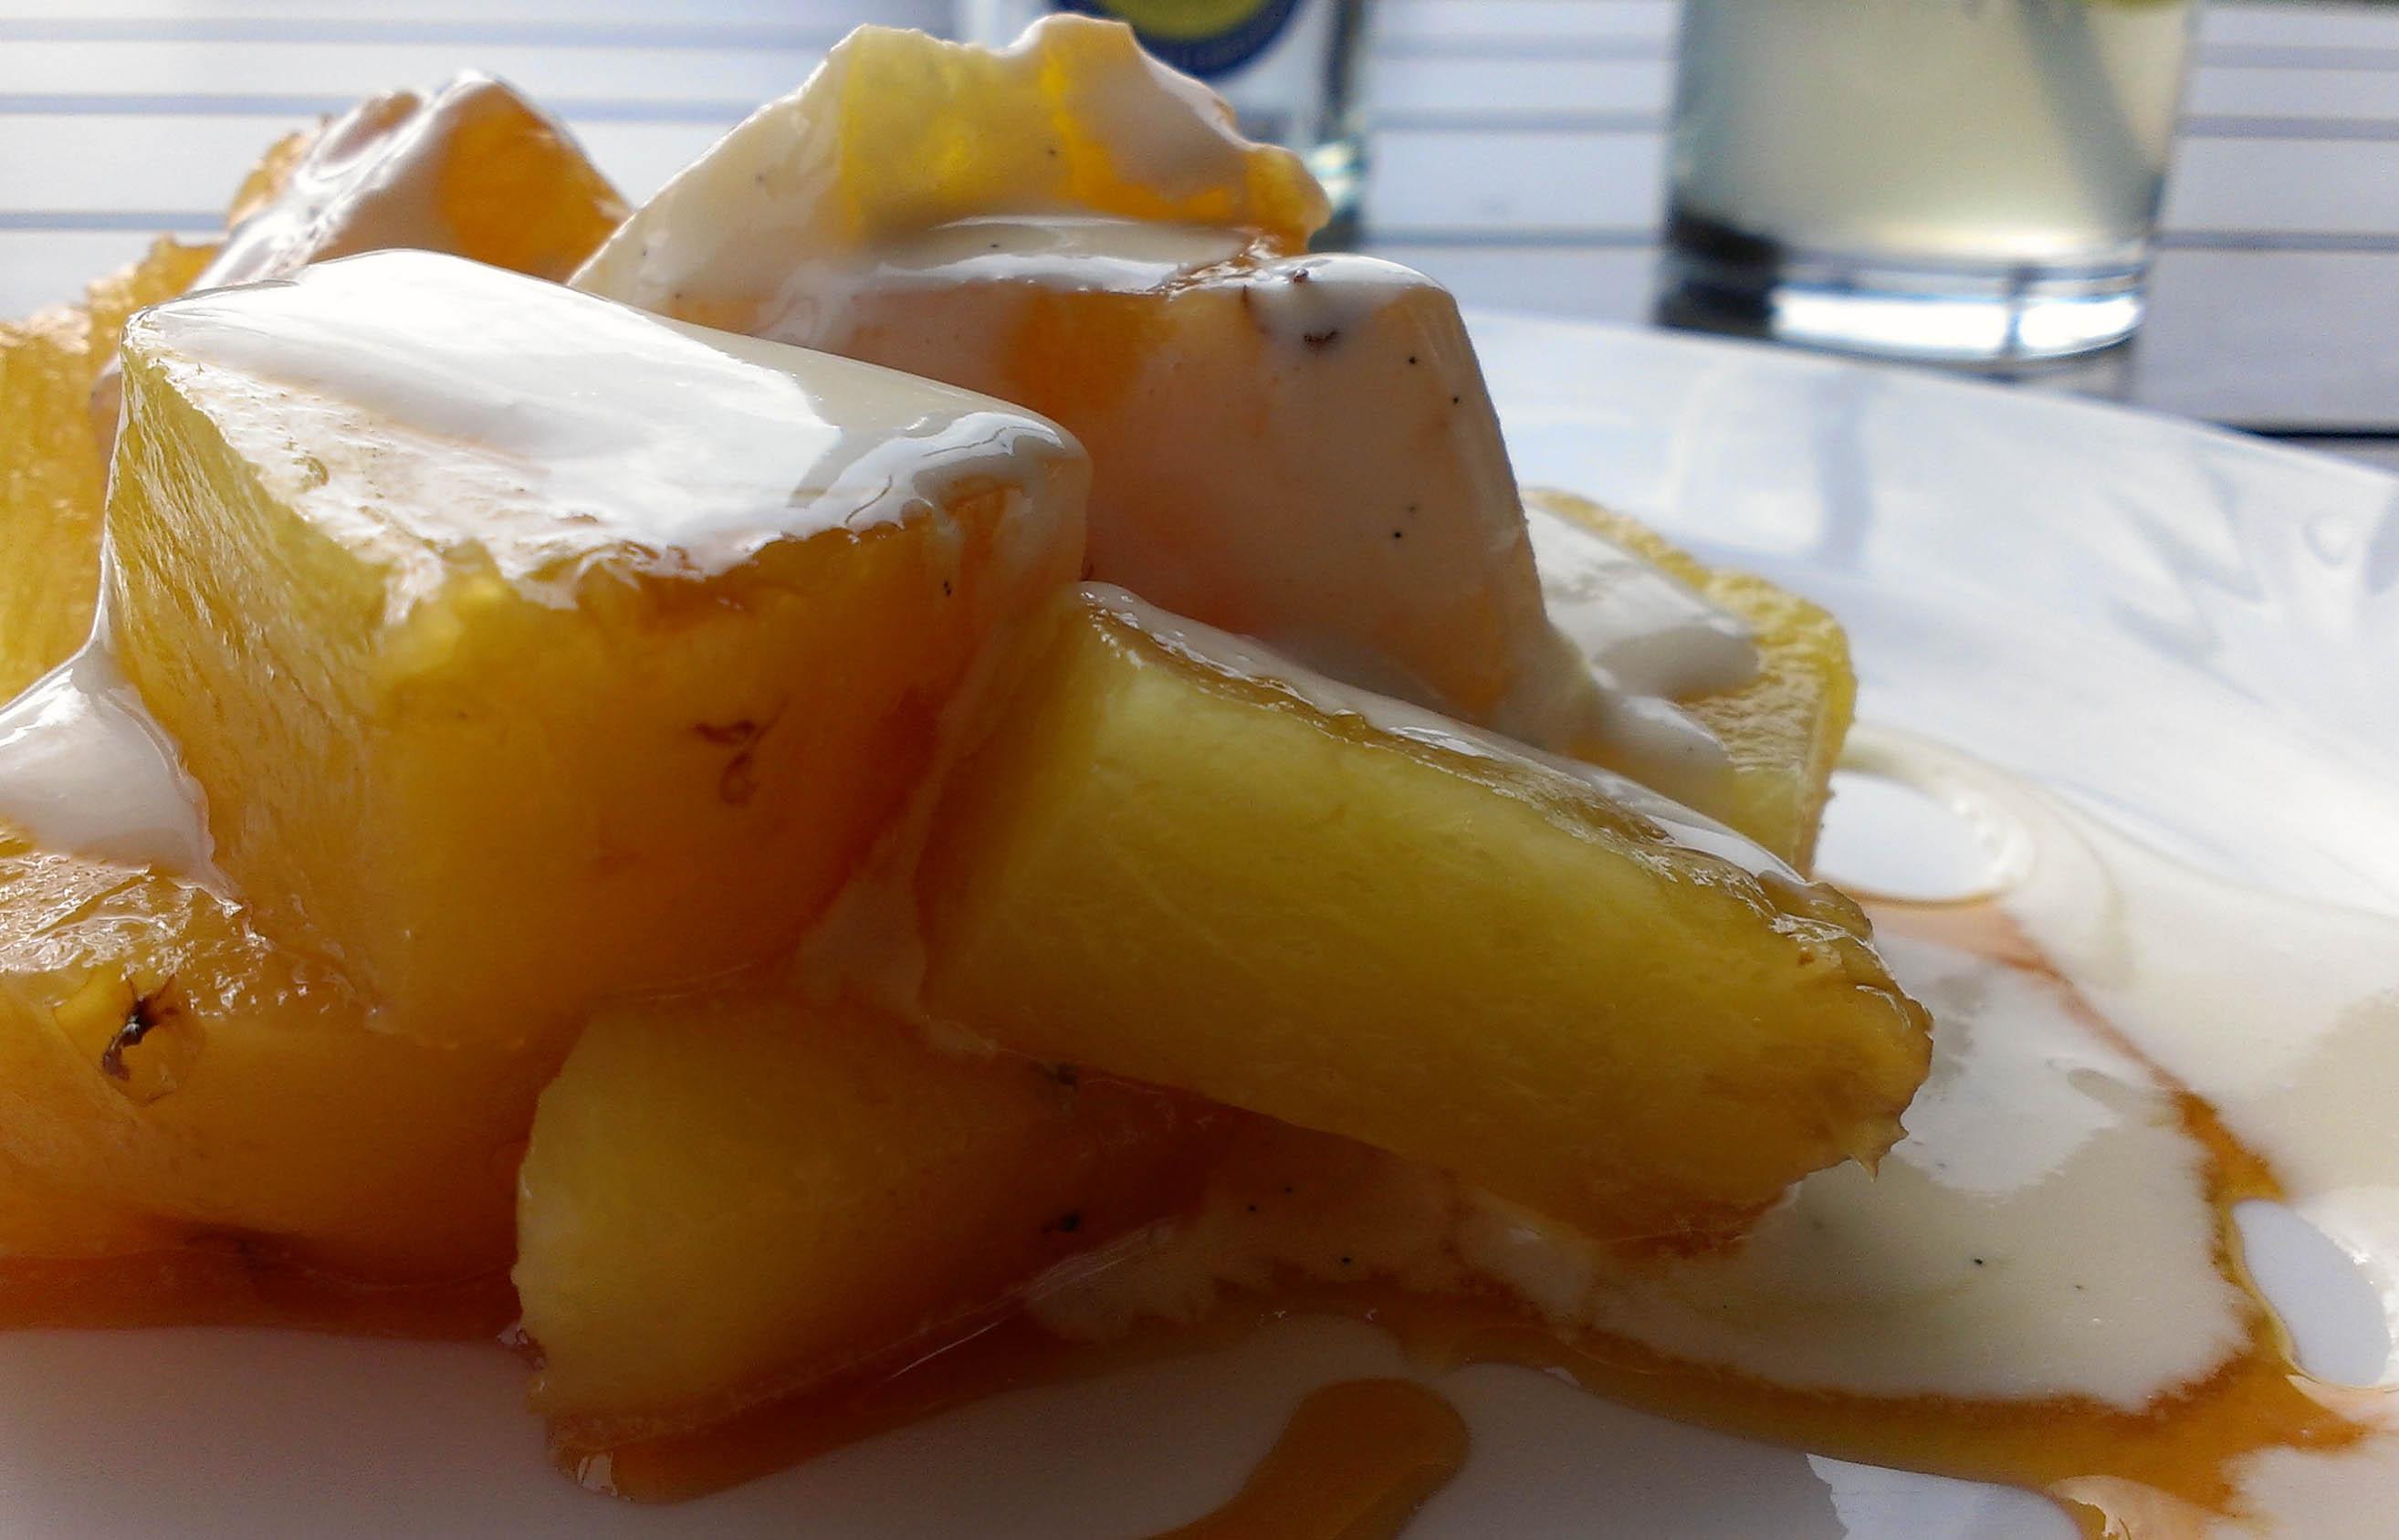 Ashmolean Dining Room Roasted Pineapple